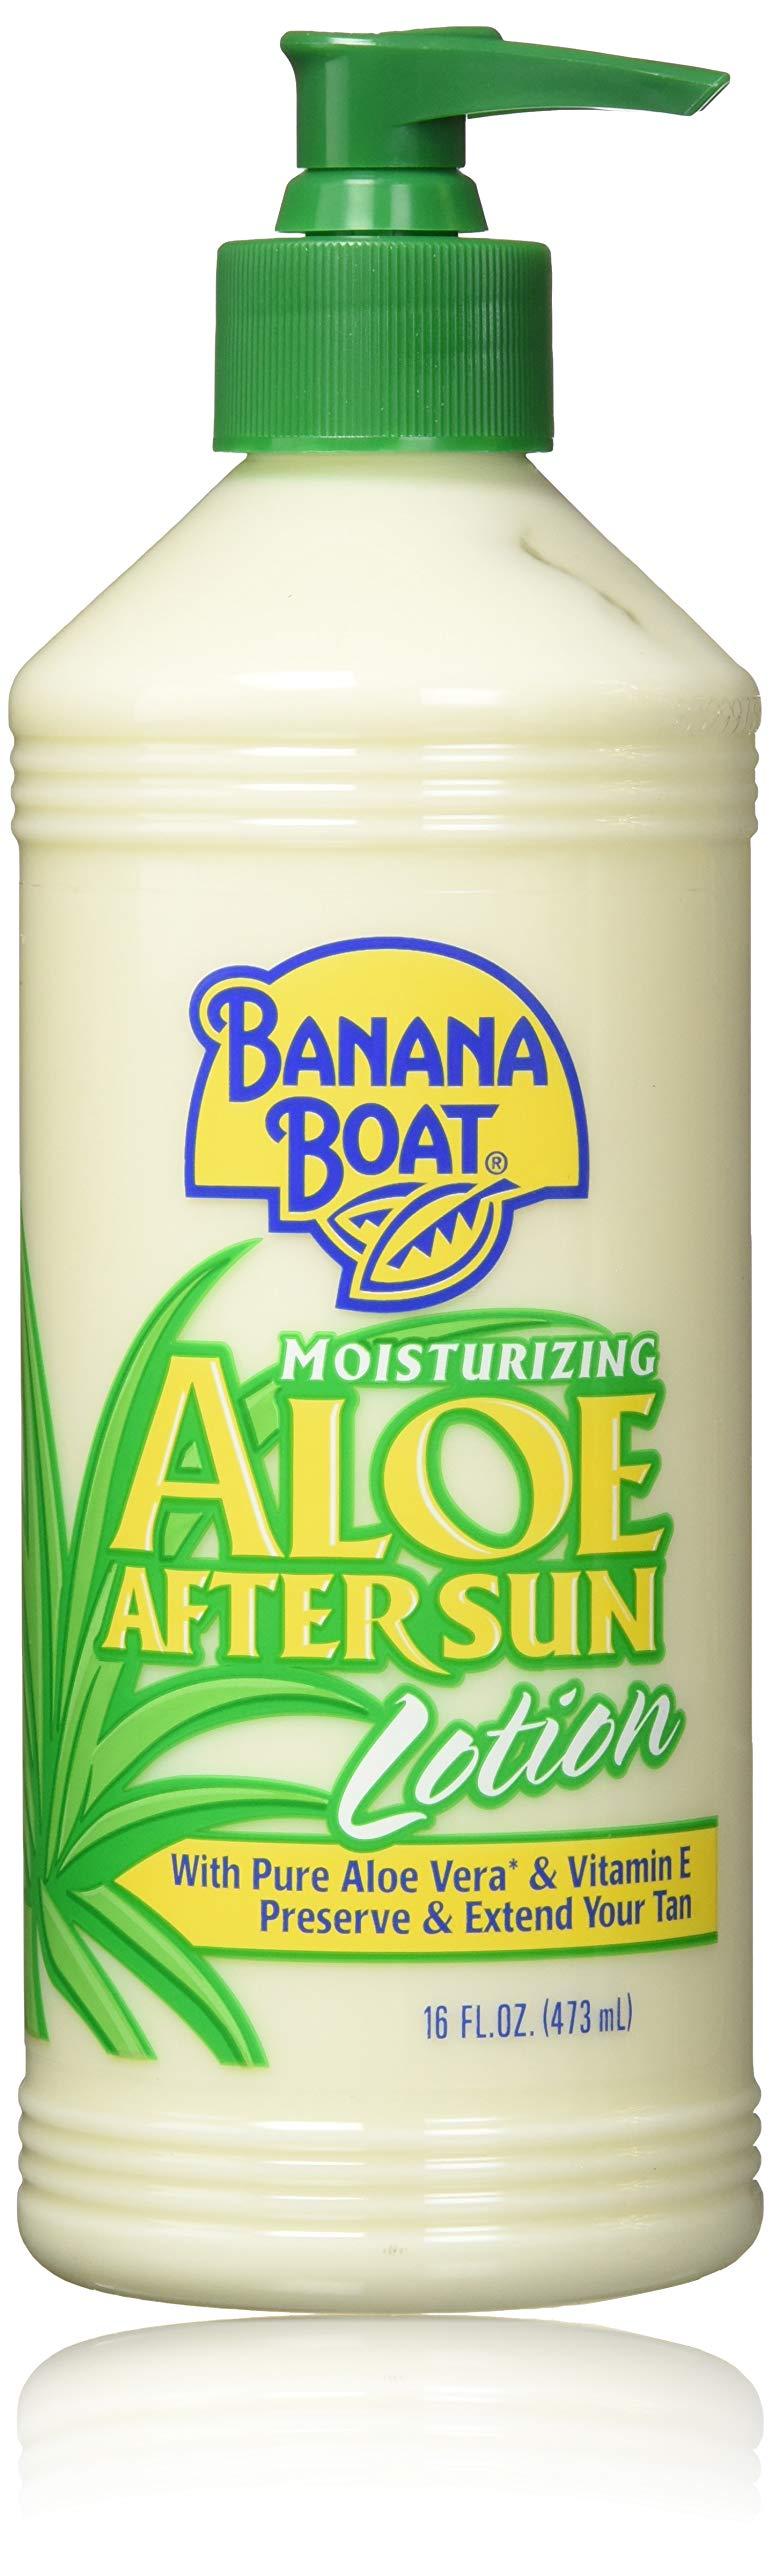 Banana Boat After Sun Lotion Aloe, 16 Fl Oz. (Pack of 2) by Banana Boat